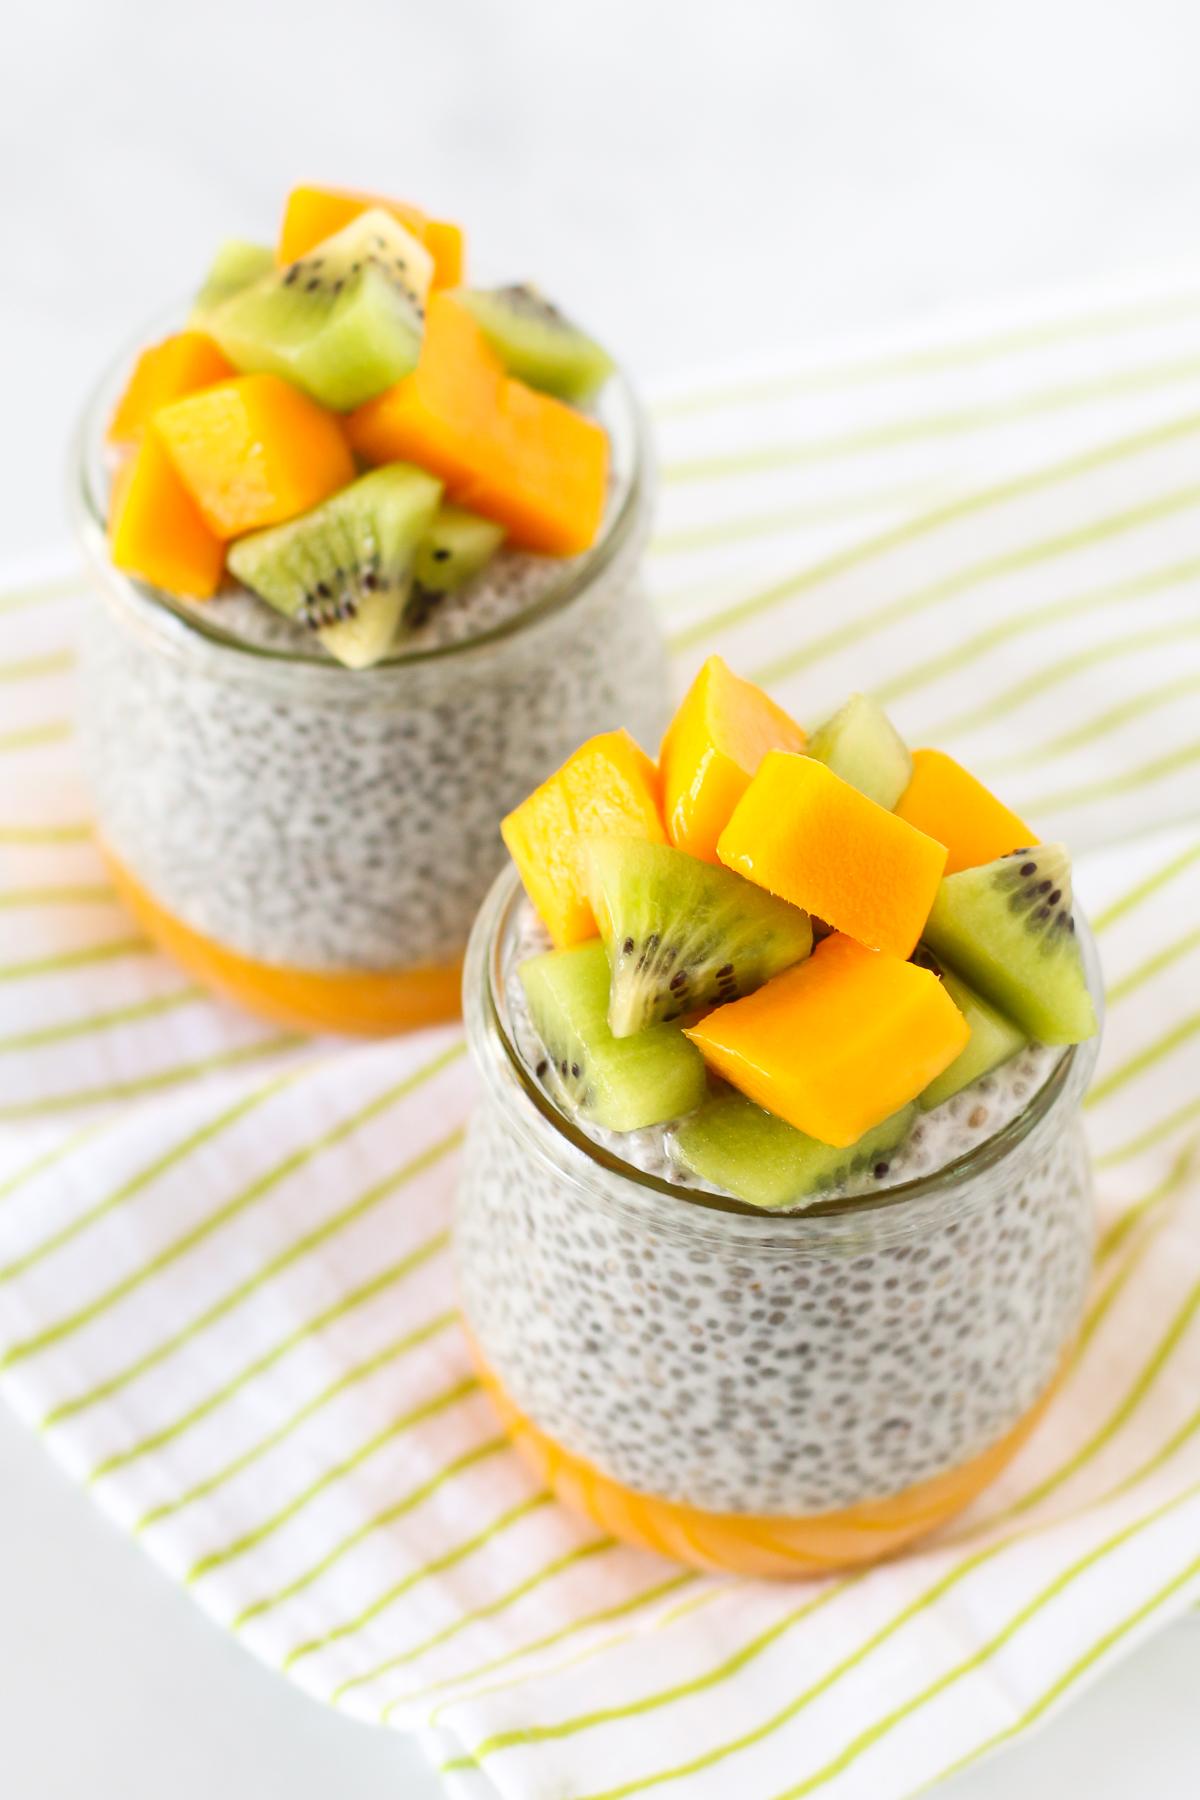 Dairy Free Mango Chia Pudding. Layers of fresh mango puree, vanilla chia seed pudding and fresh fruit. A tropical treat!